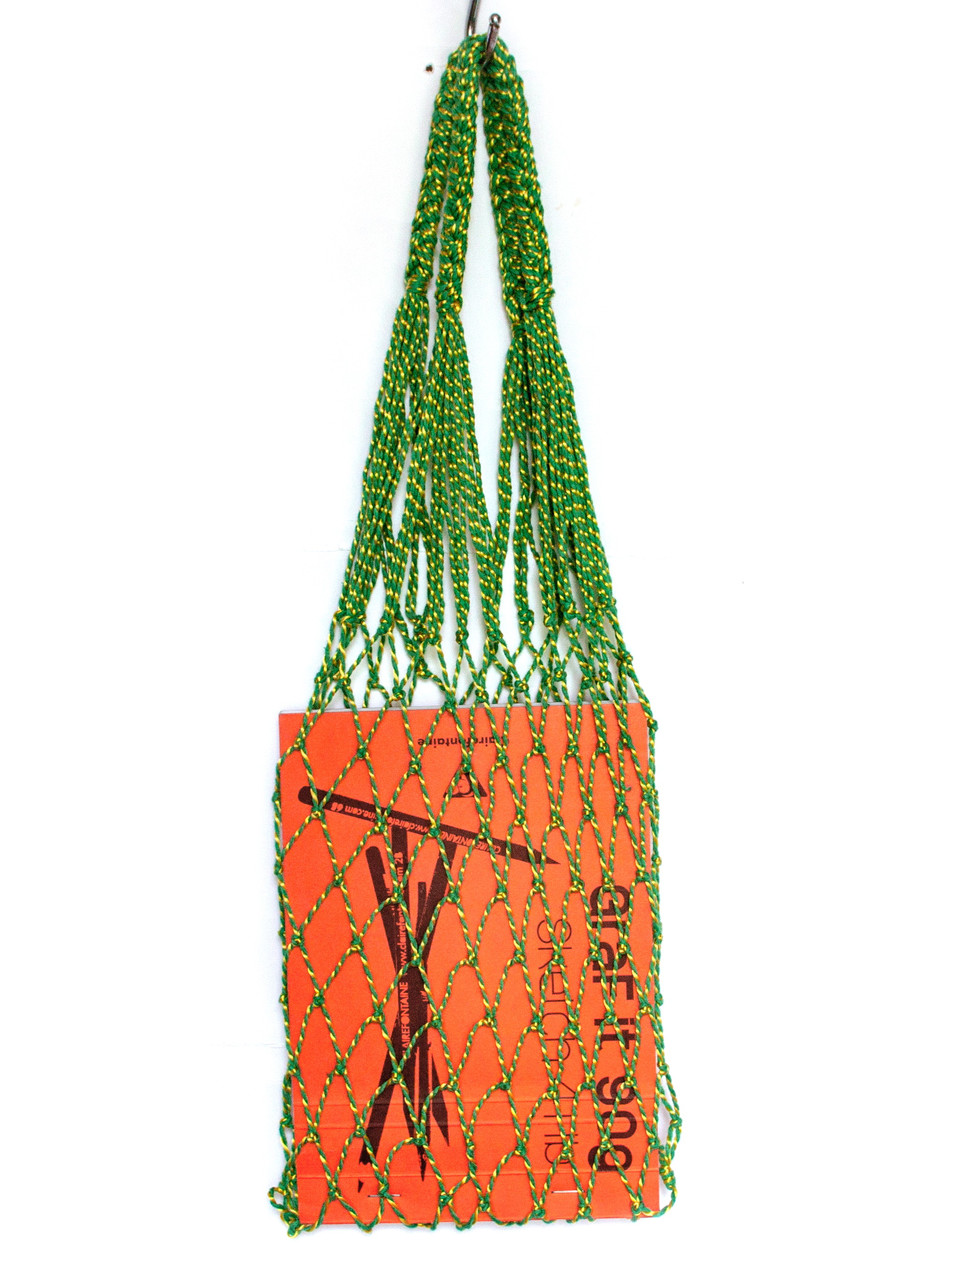 Сумка -  Прочная сумка Авоська мини - зелёная-желтая